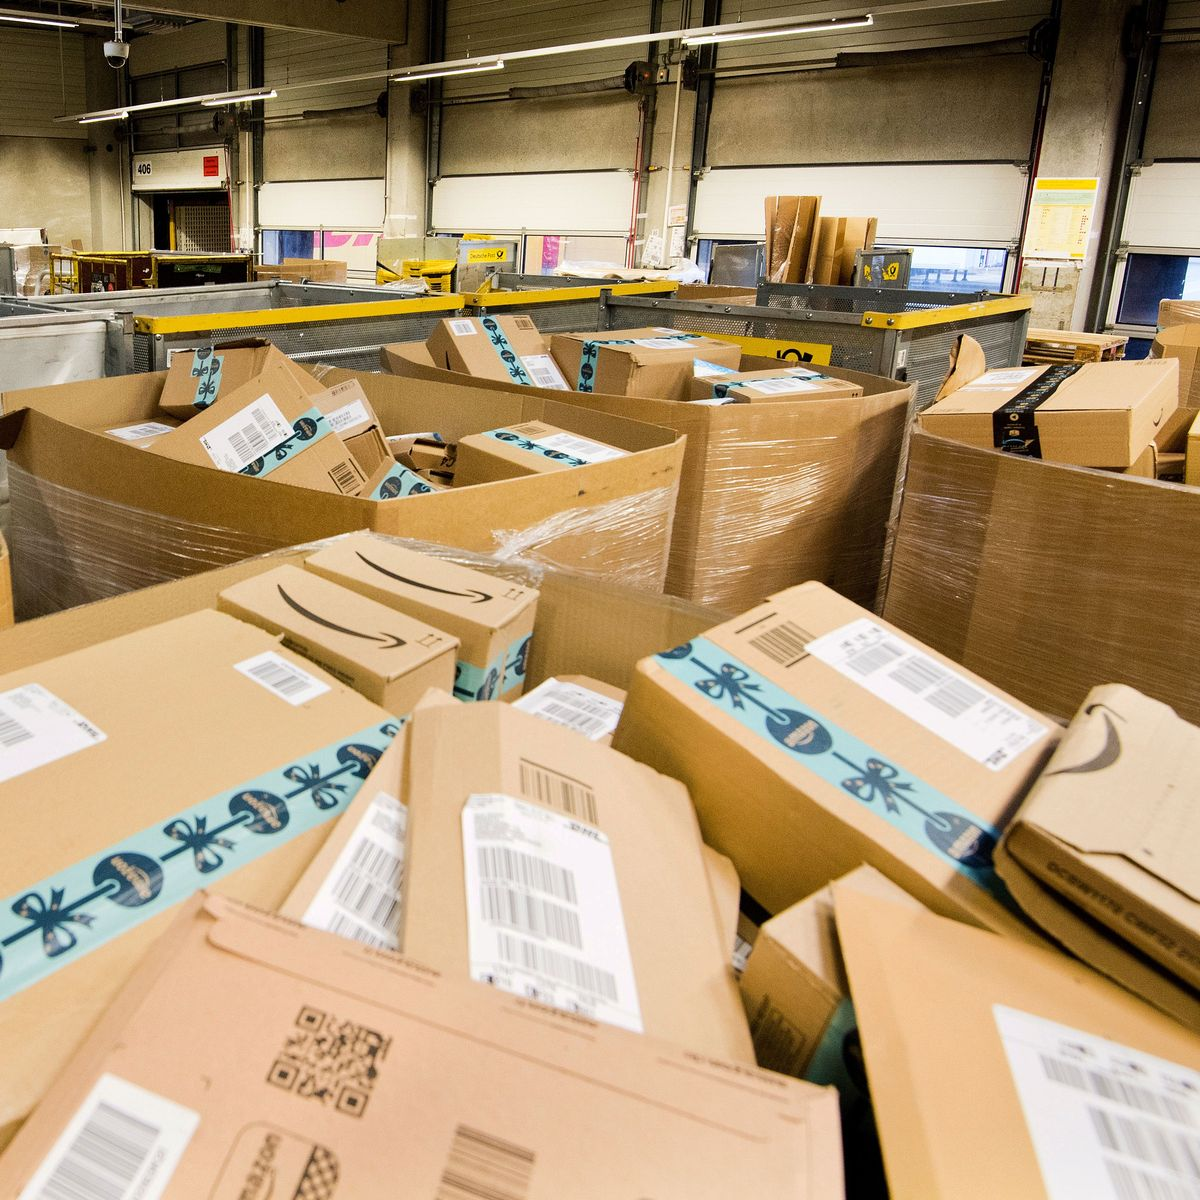 Paket Verpacken Ohne Karton